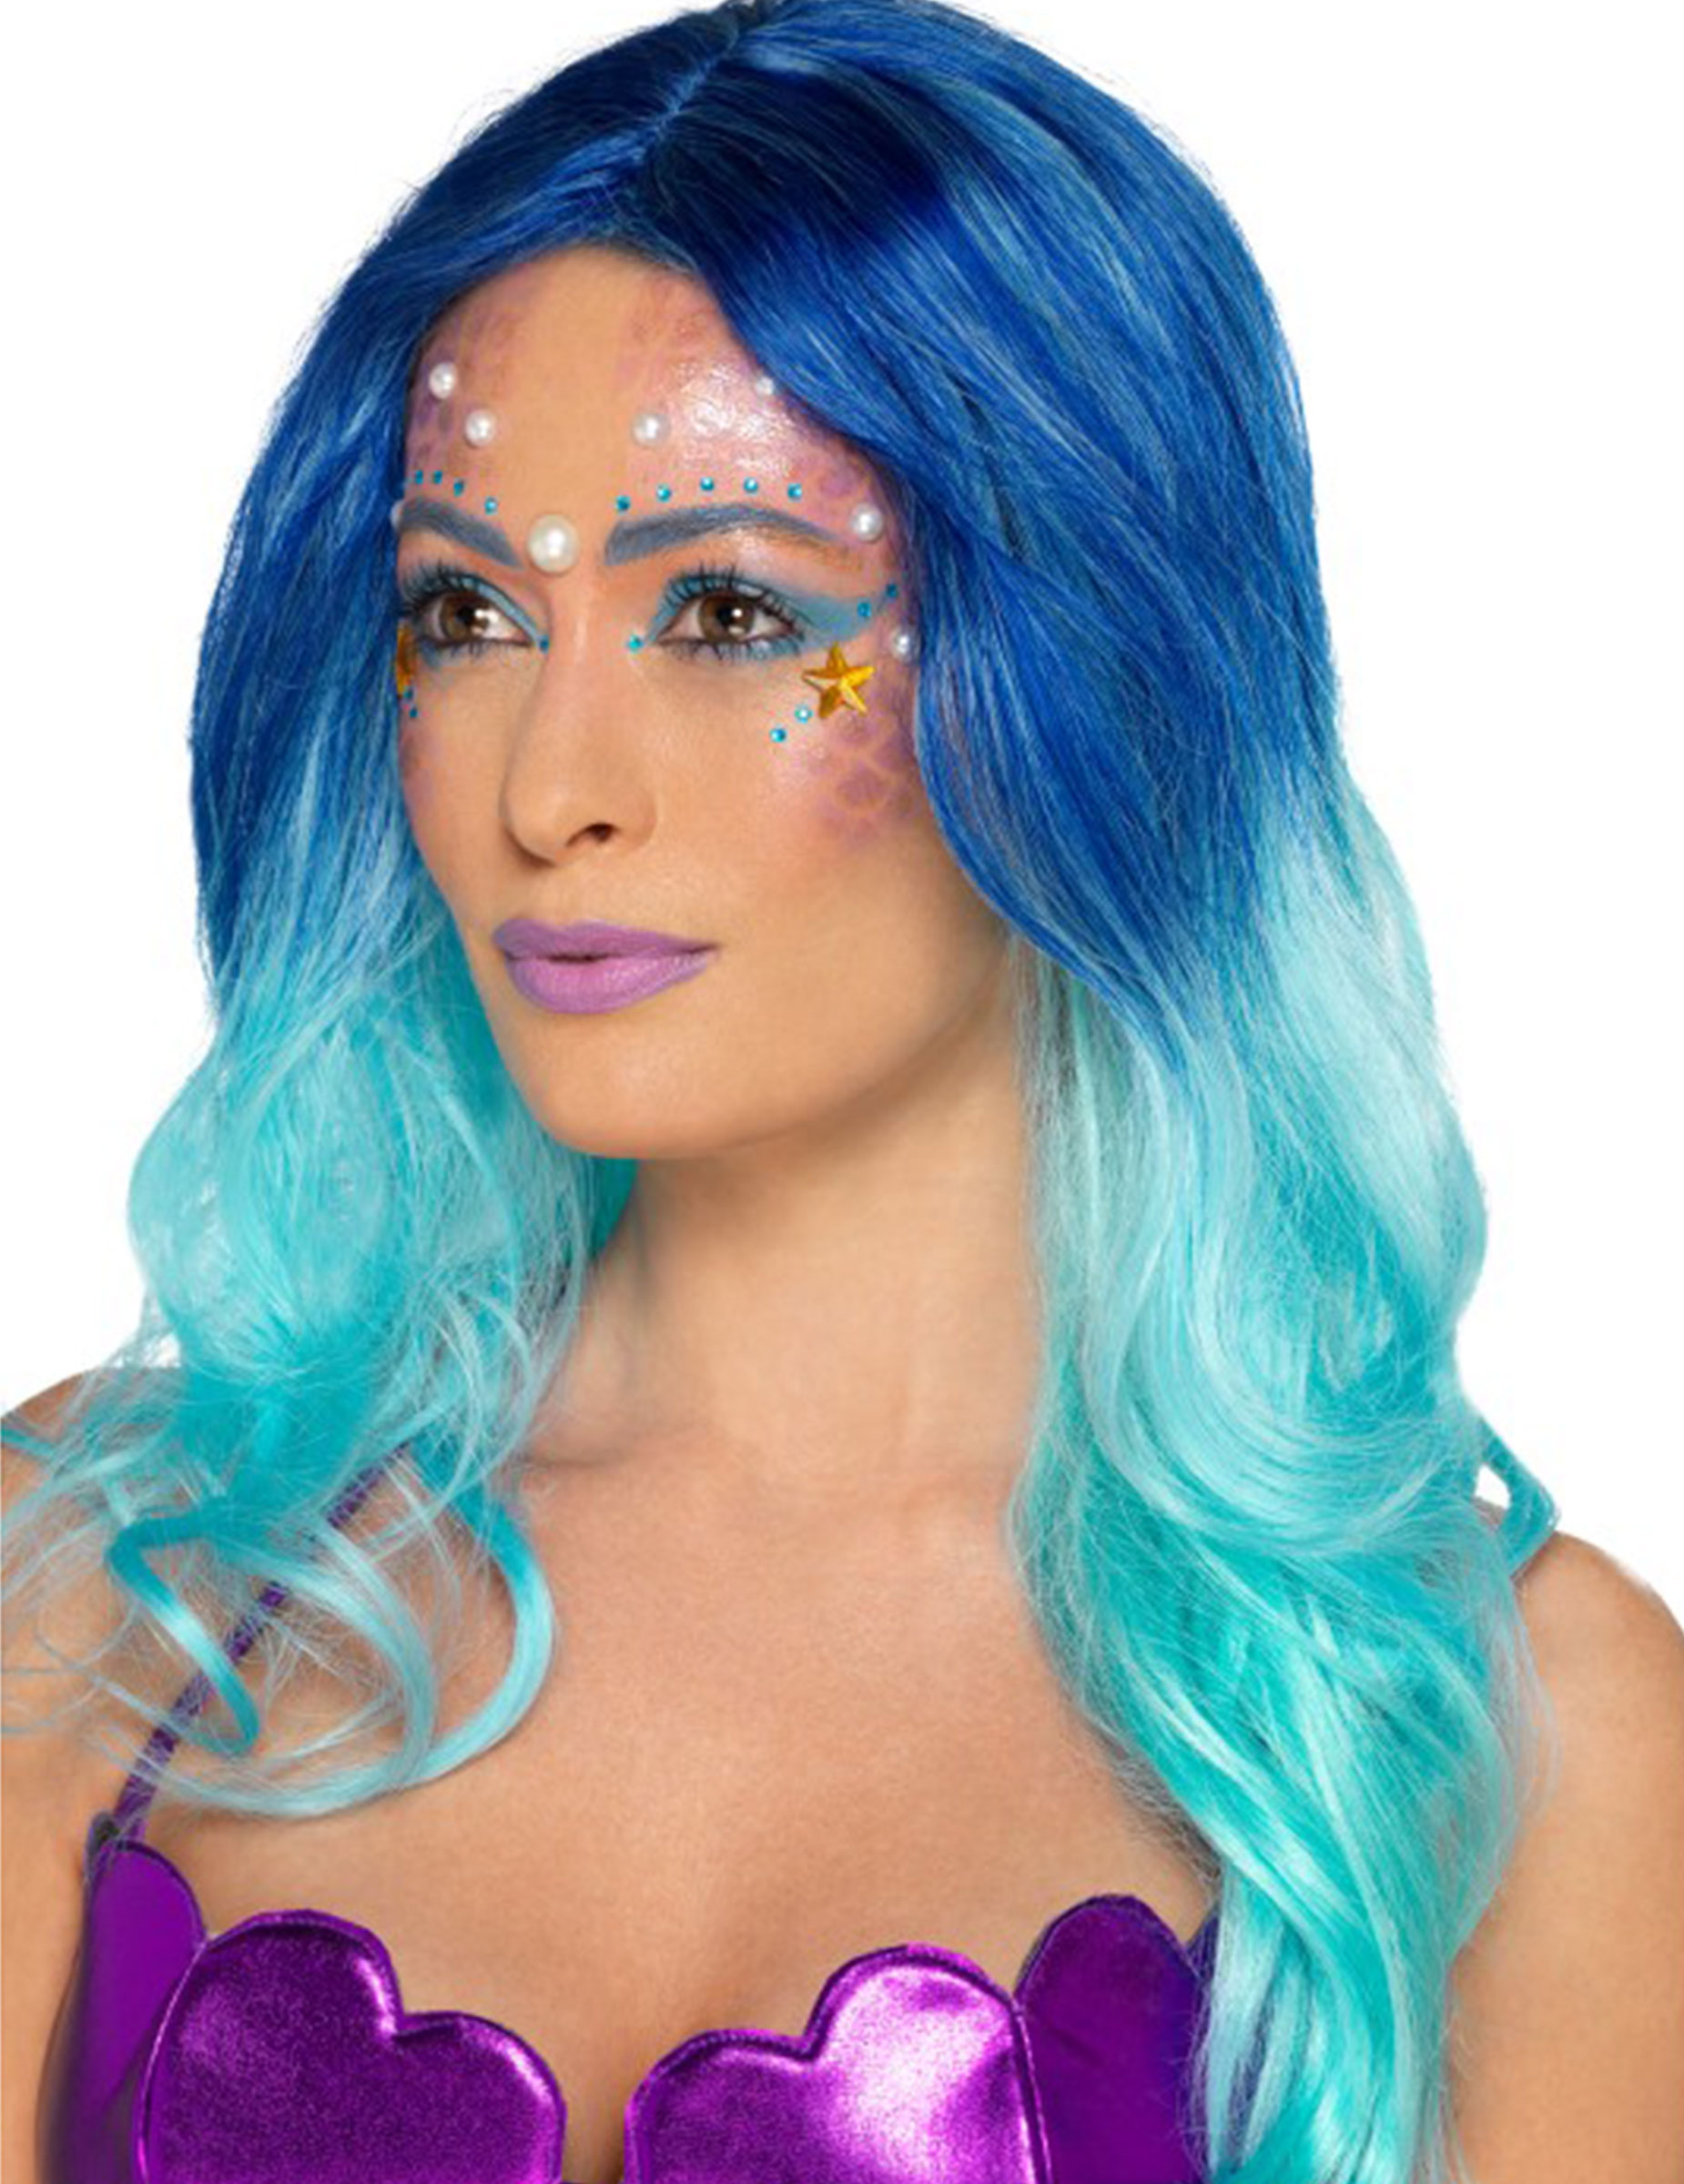 Kit maquillage sirène envoutante femme   Deguise-toi 2c62011a02f